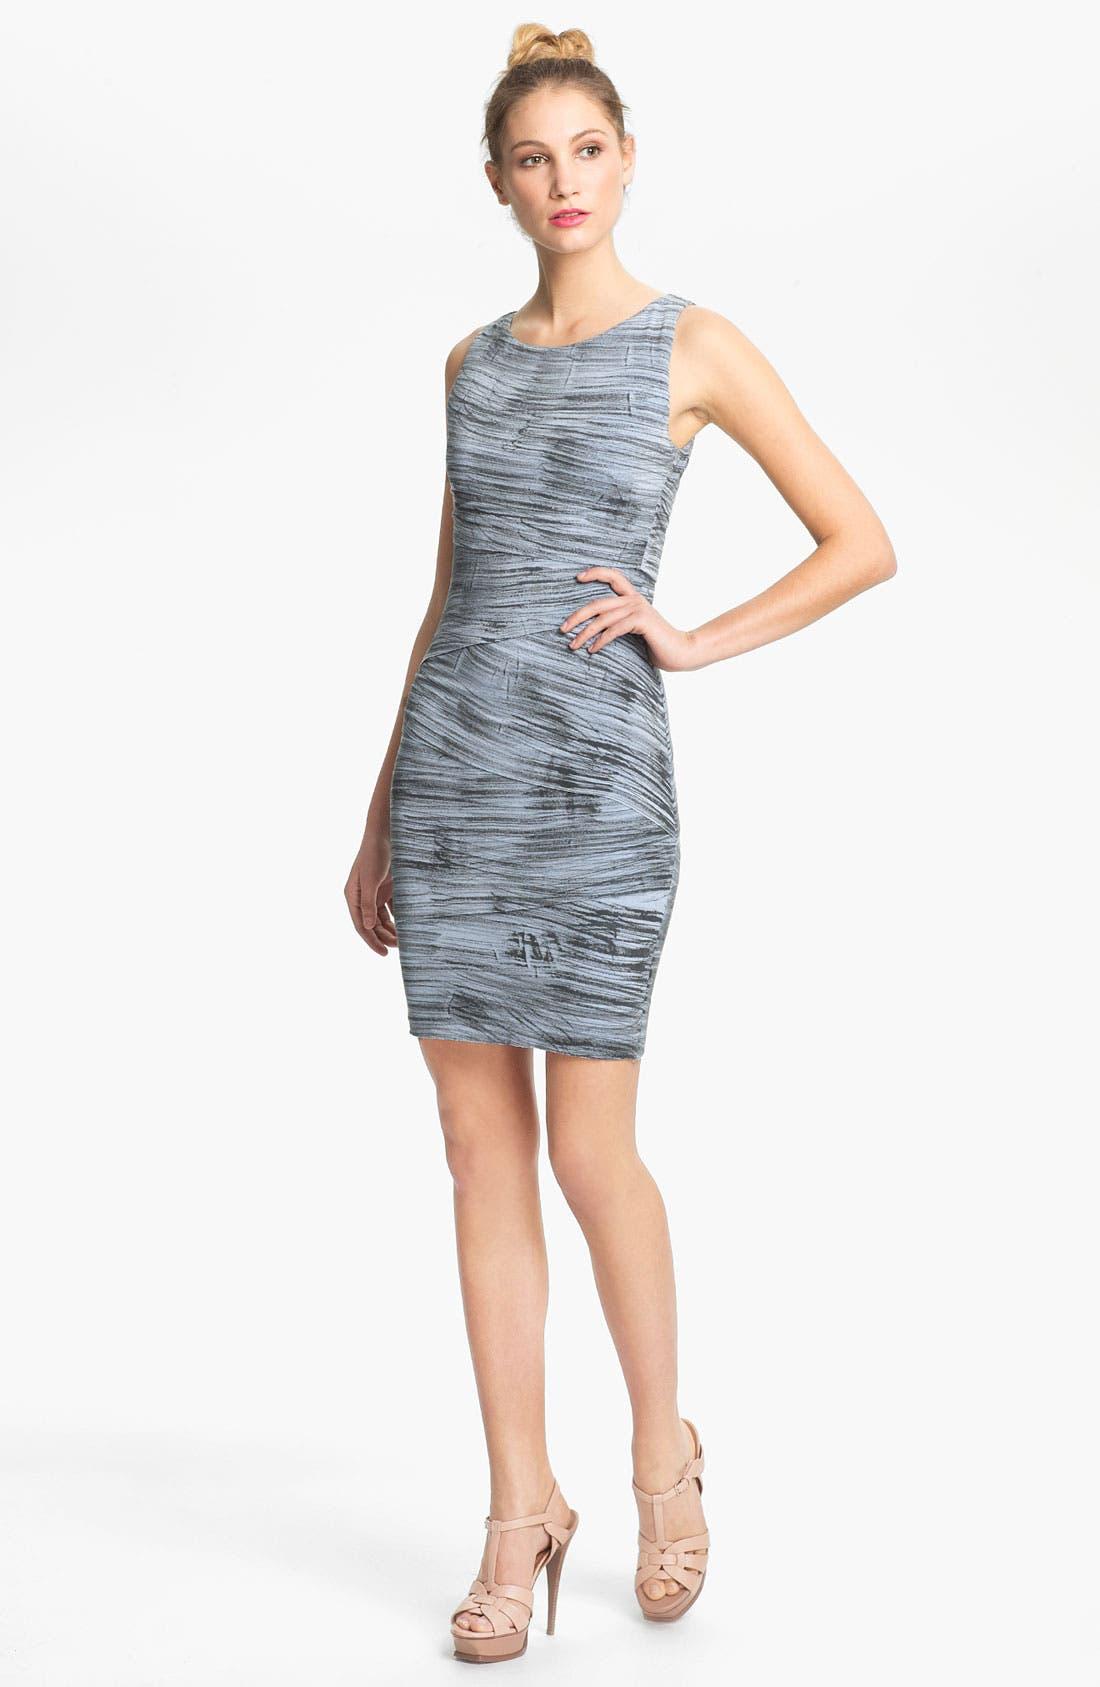 Main Image - B44 Dressed by Bailey 44 'Rosetta Stone' Contour Print Dress